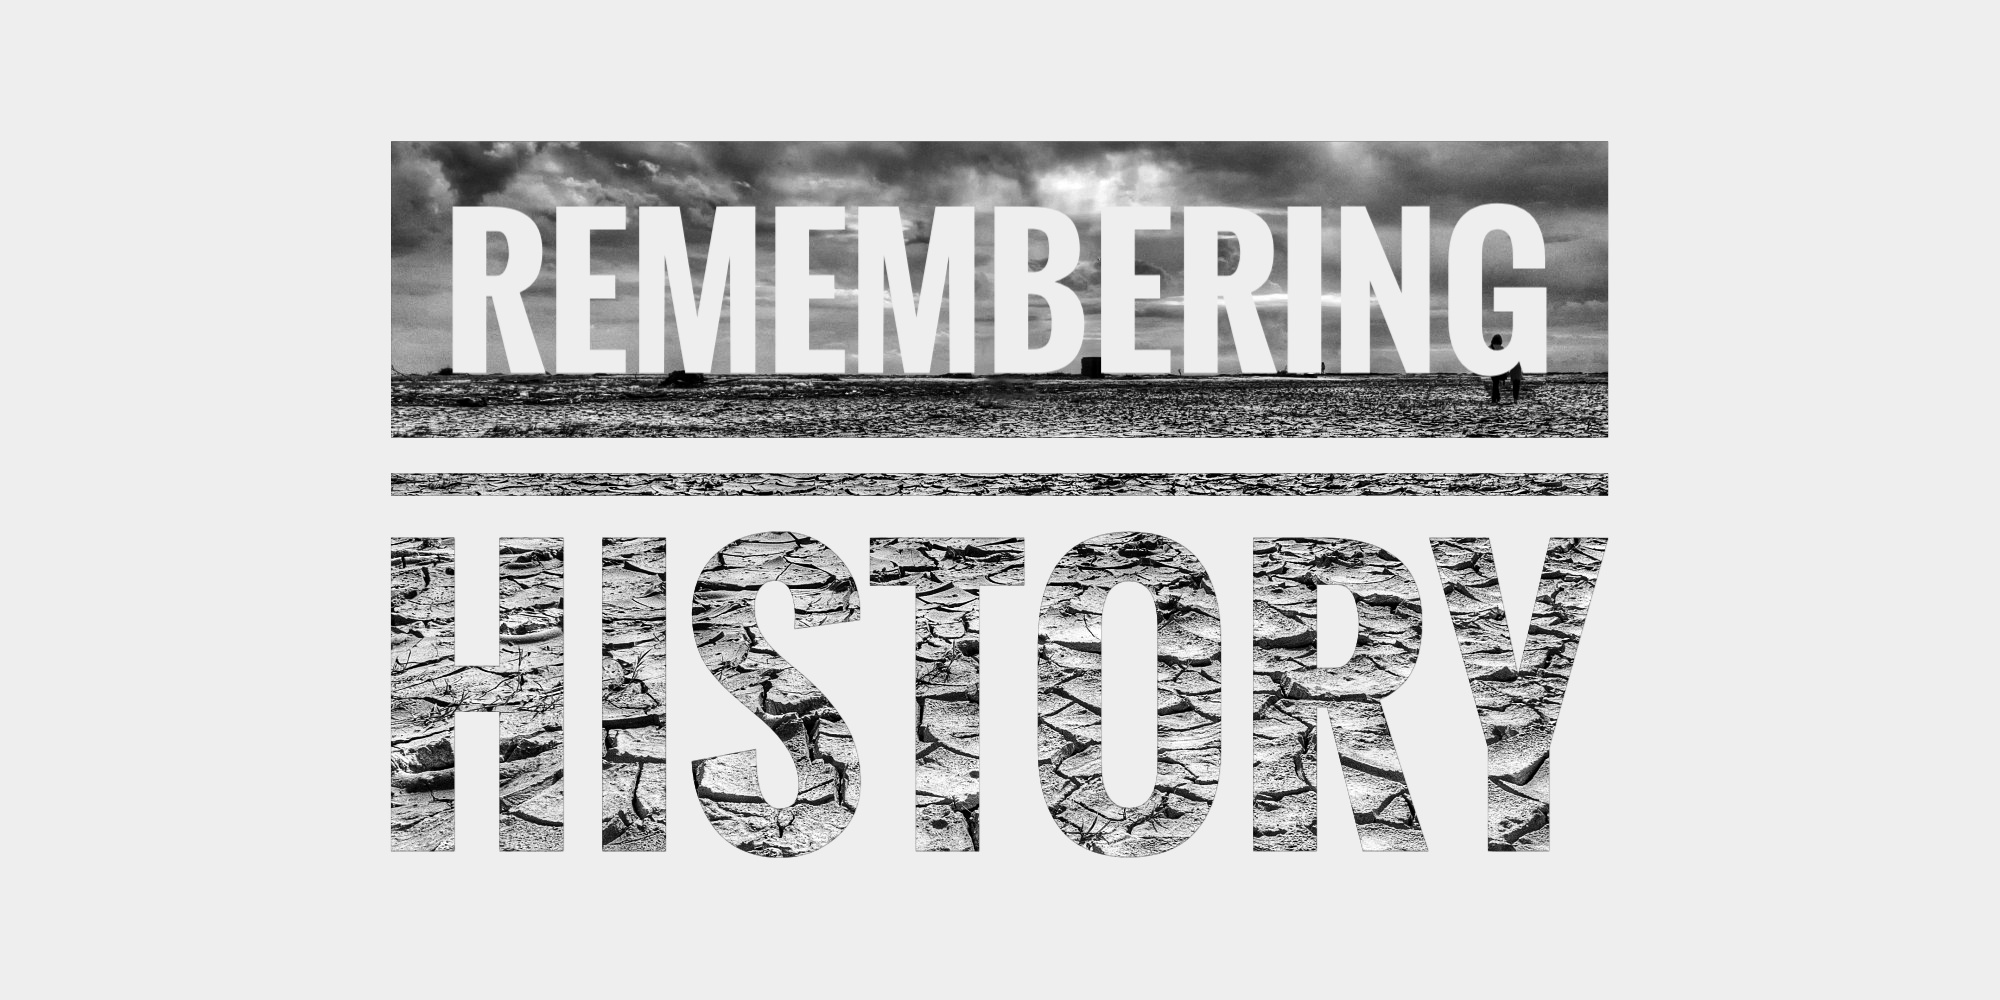 remembering history 03.31.19.jpeg